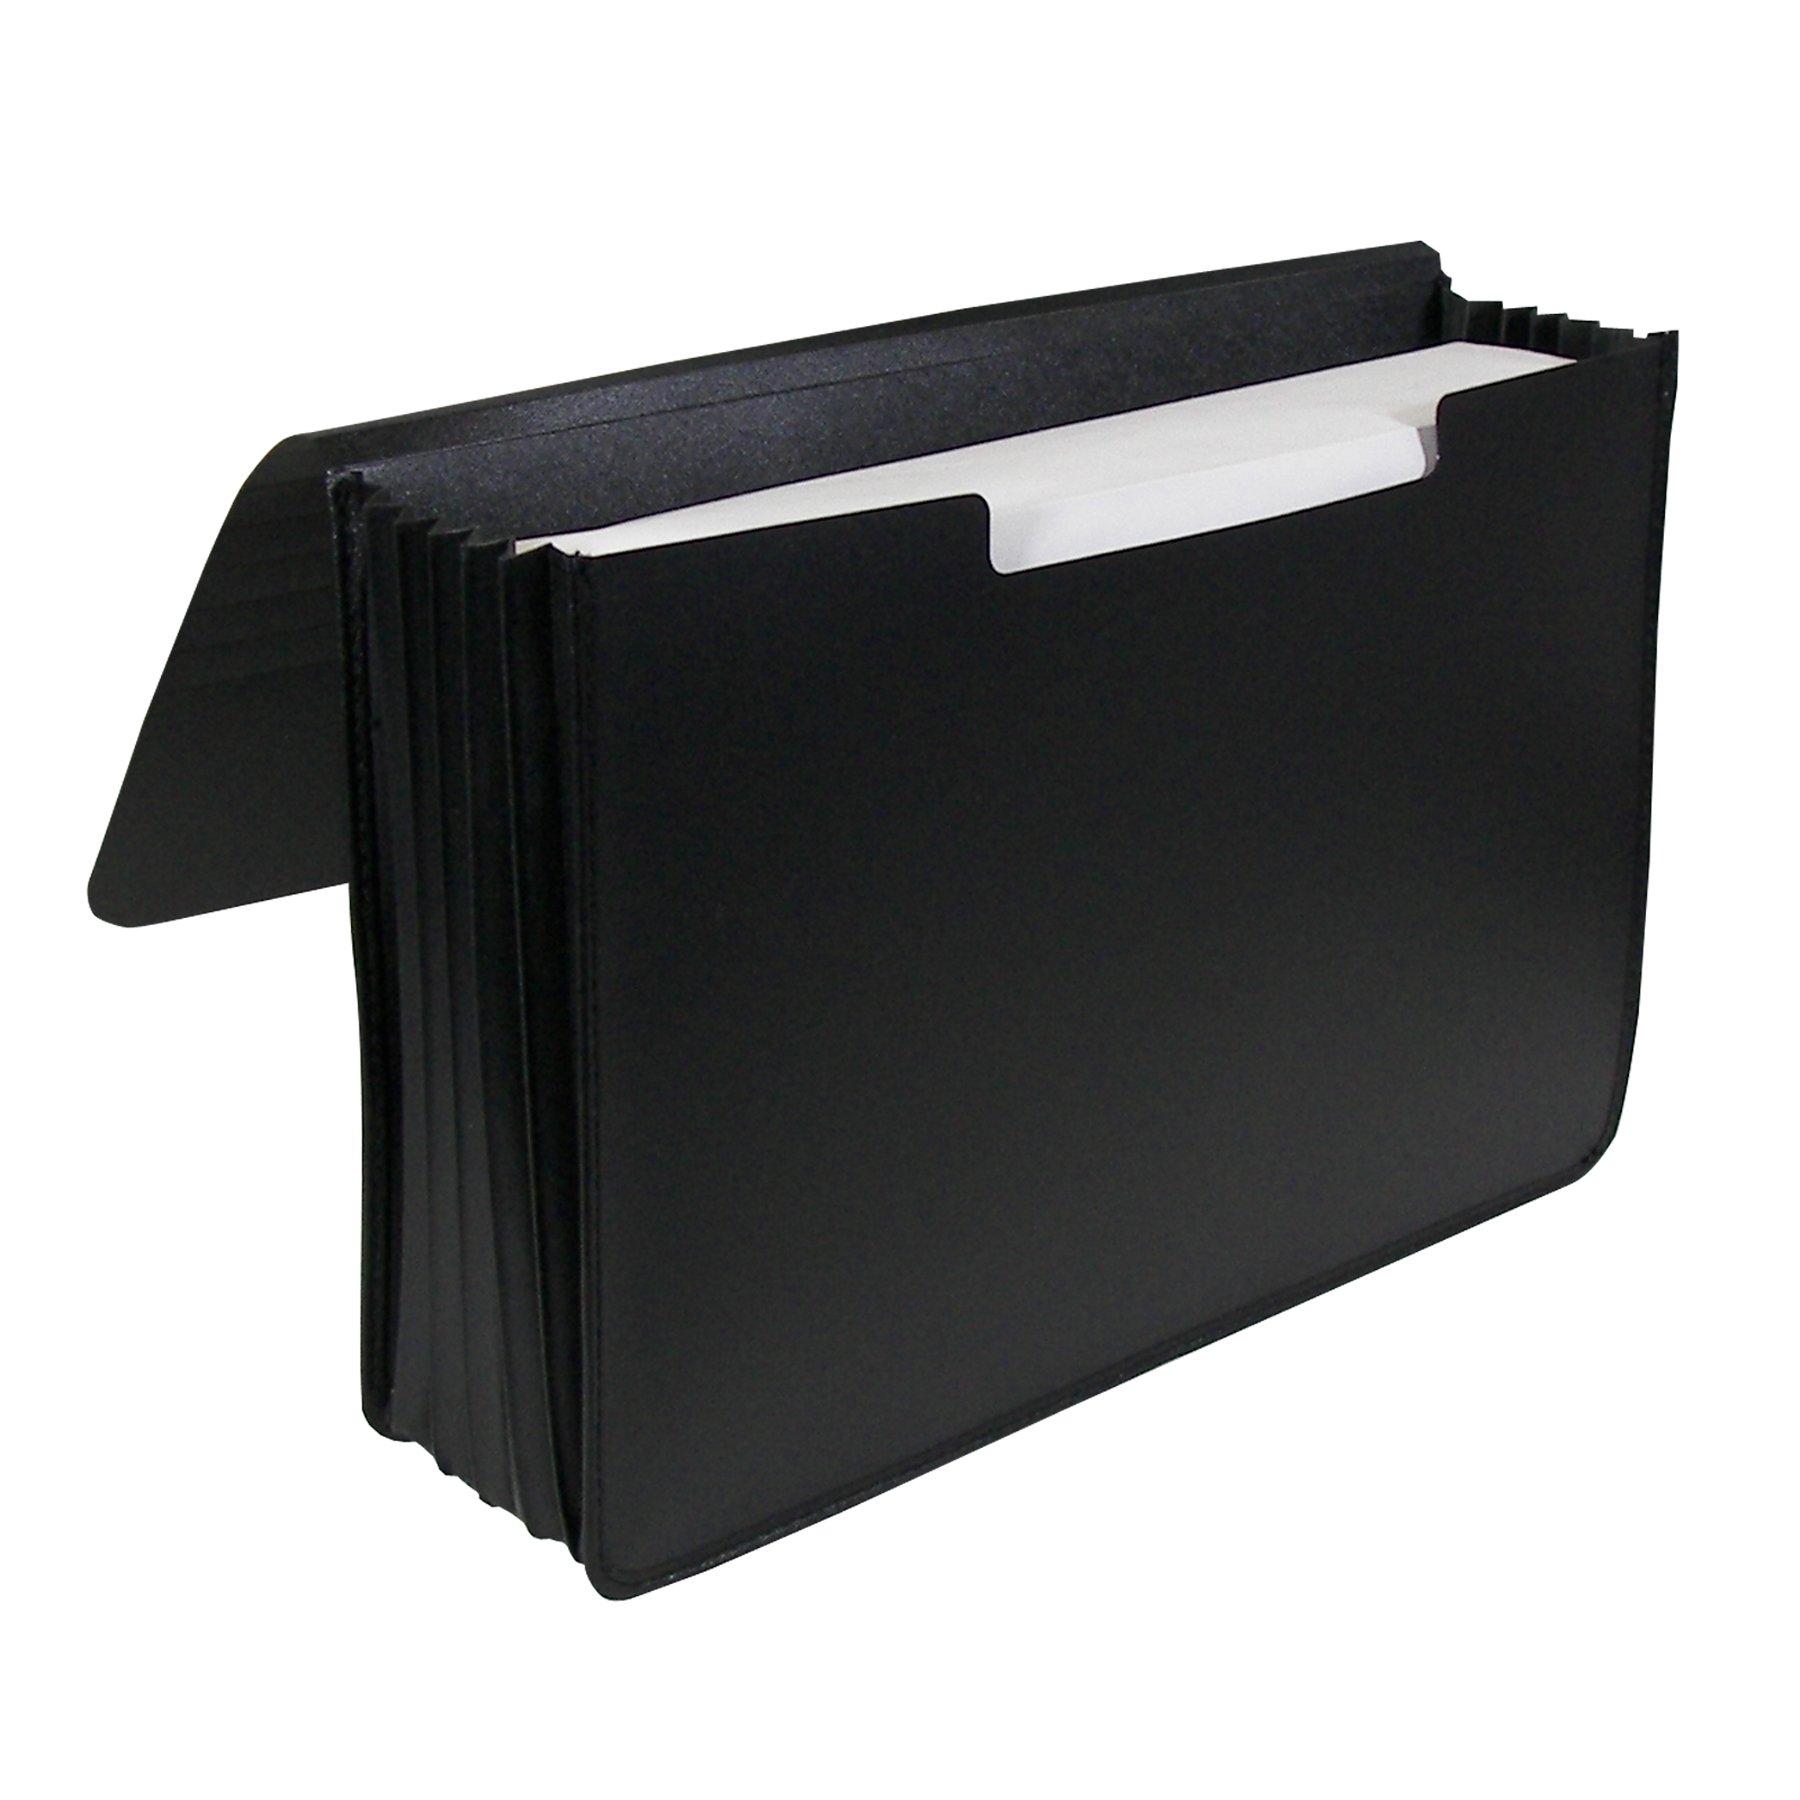 C-Line Extra Large Poly Document Case, Legal Size, 1,000-Sheet Capacity, 1 Case, Black (48011)